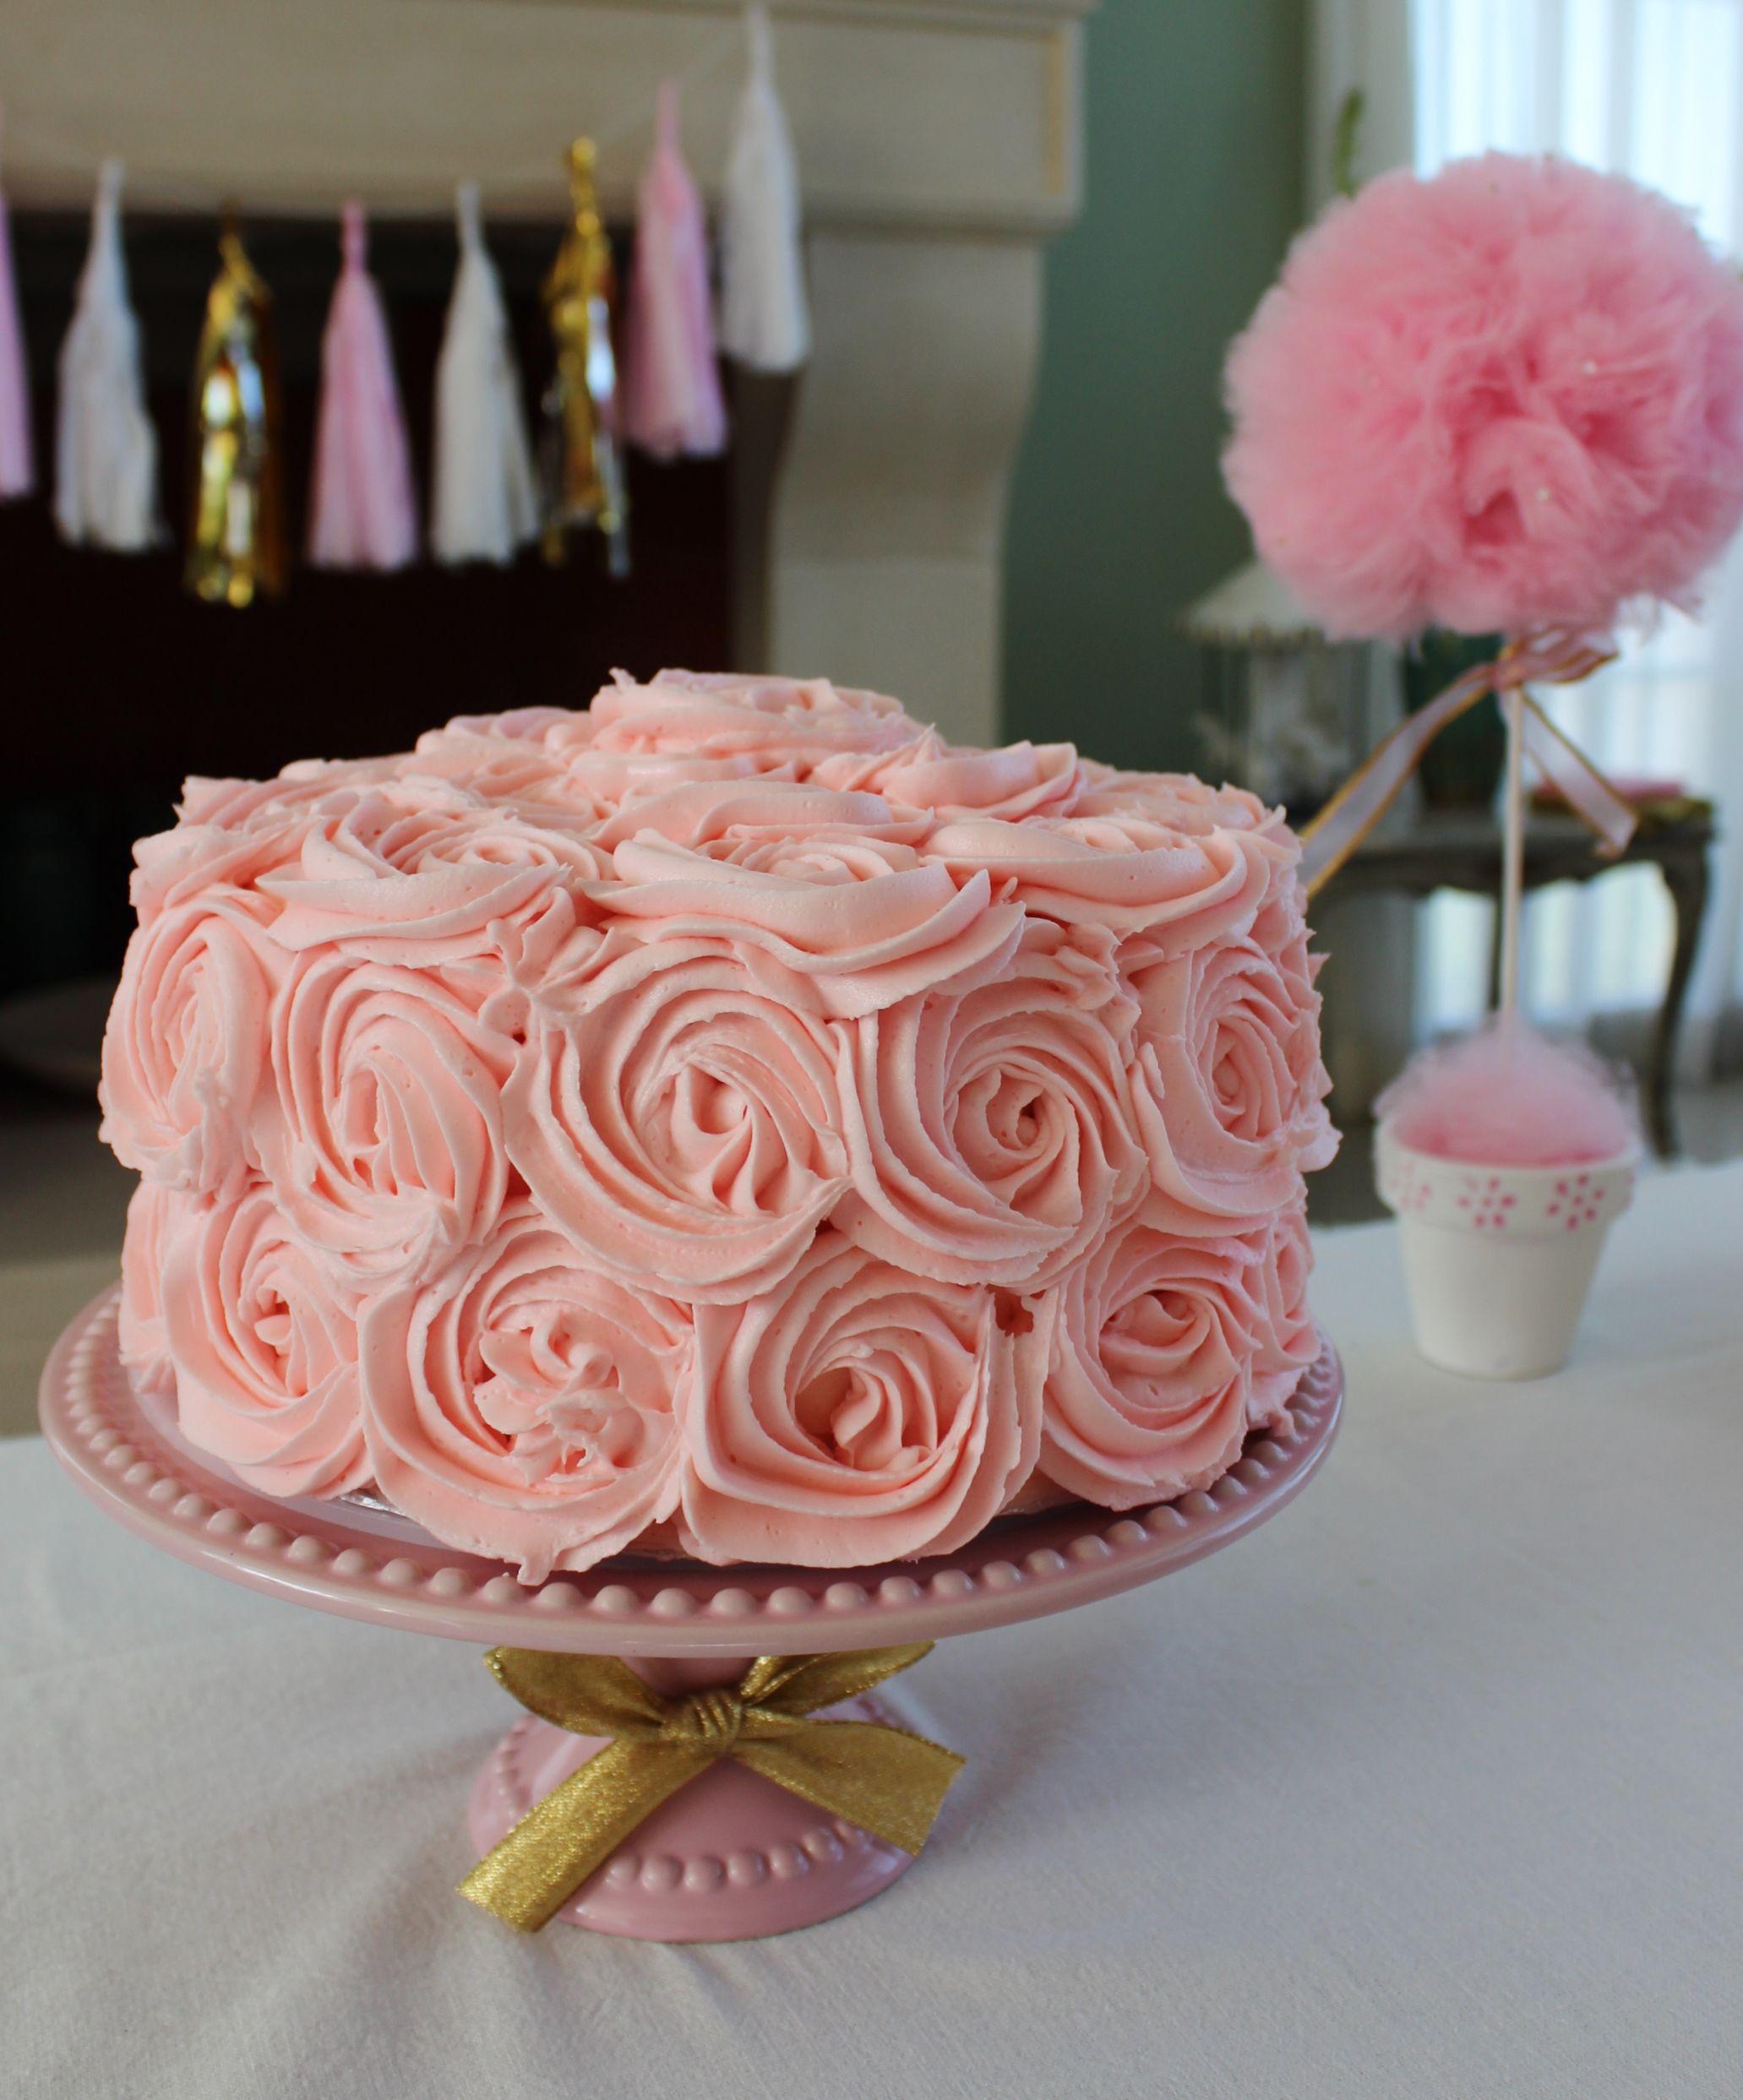 Rose Swirl Cake By Violeta Glace